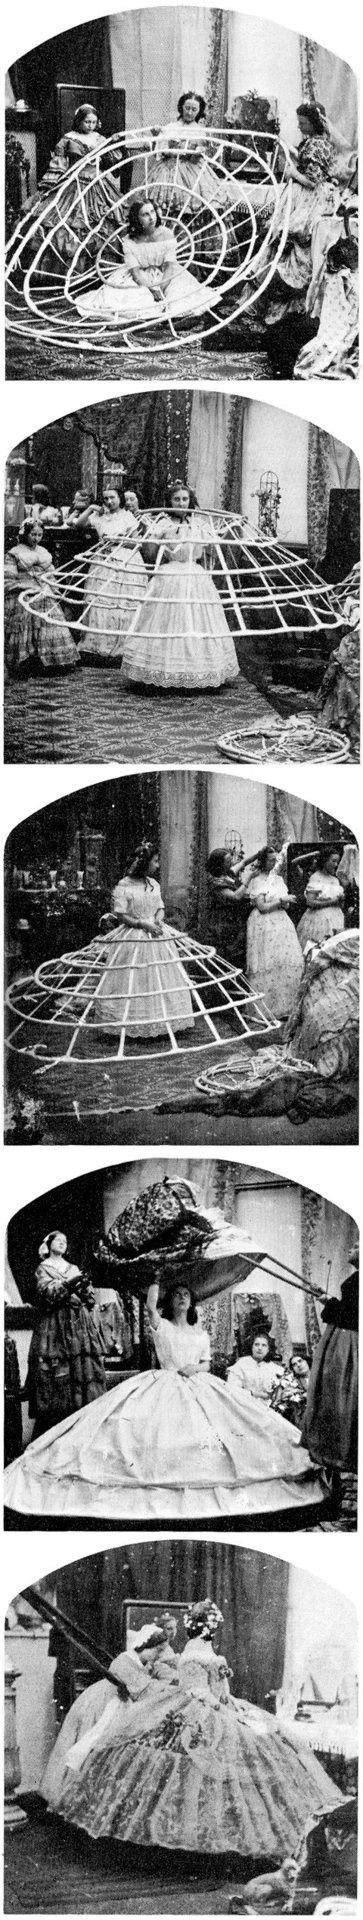 Putting on a crinoline, 1850-1860.